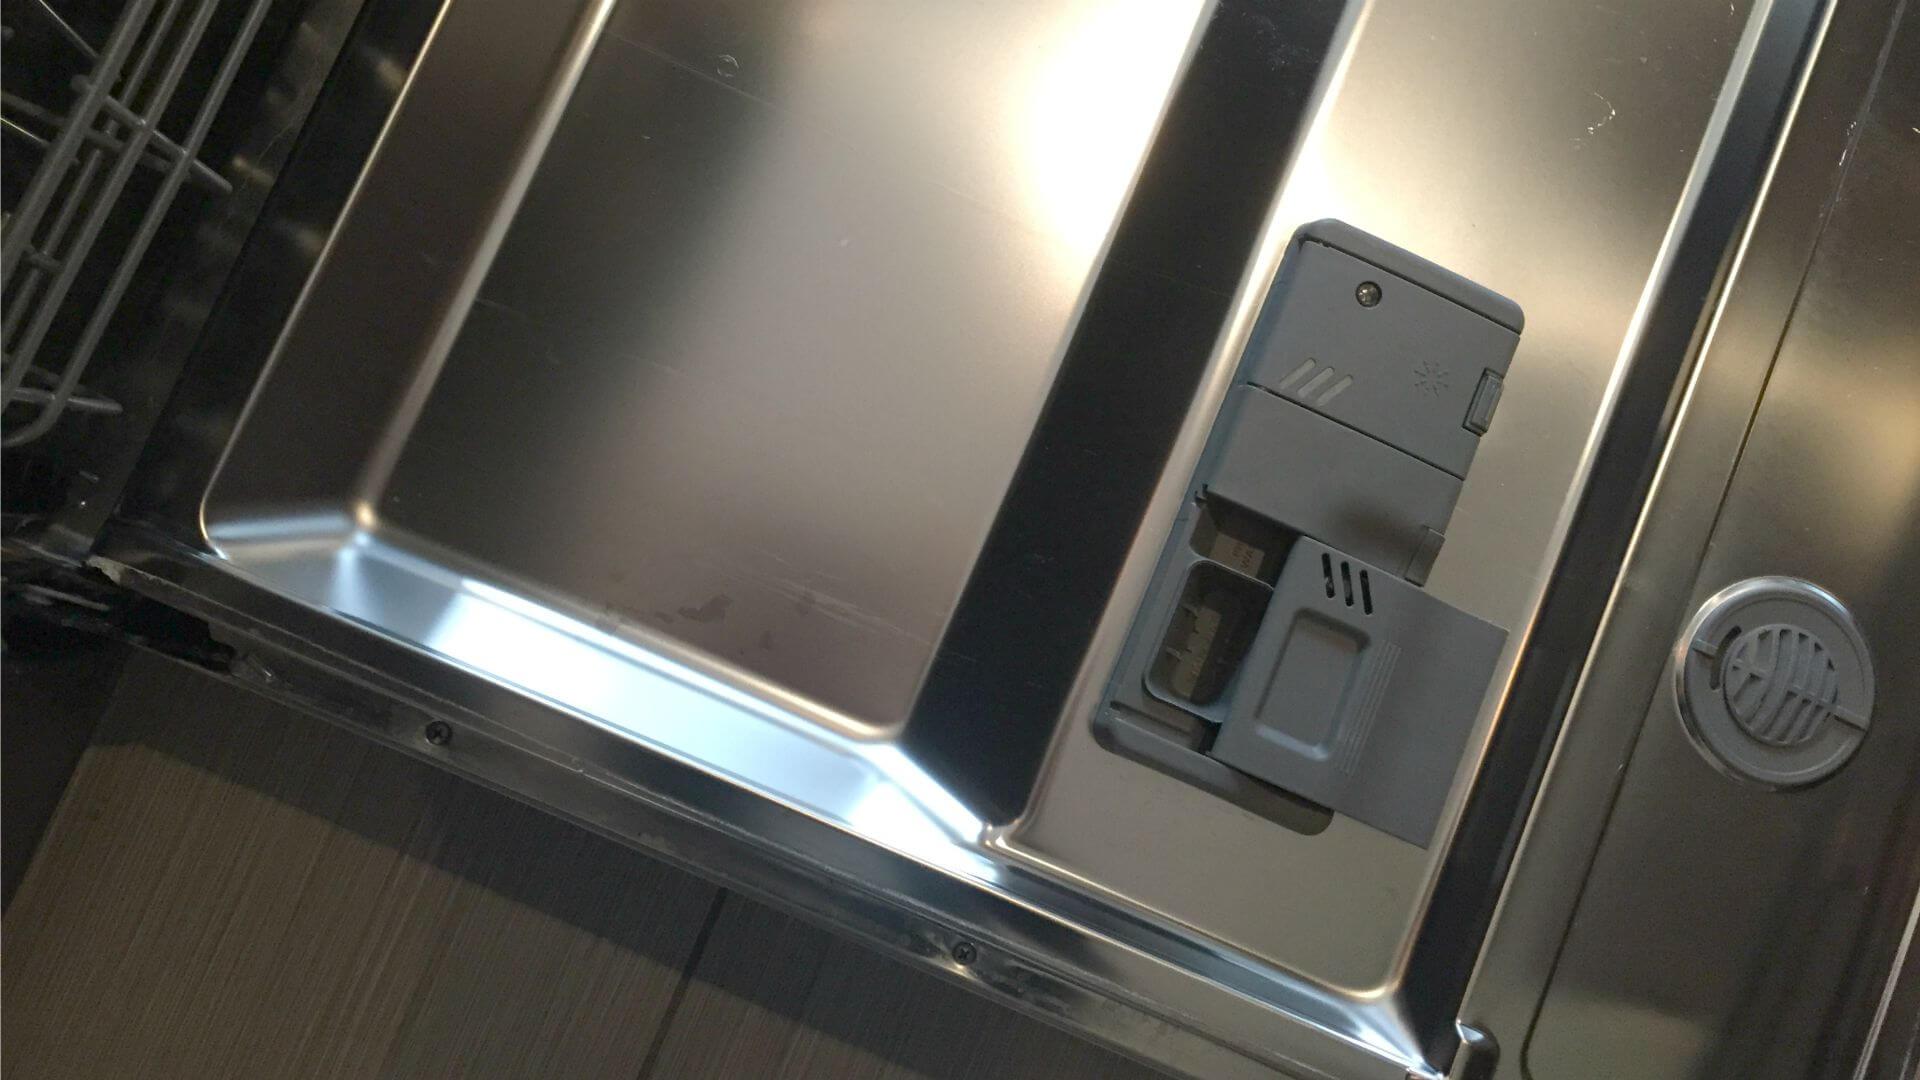 De-Gunk Your Dishwasher with Finish!